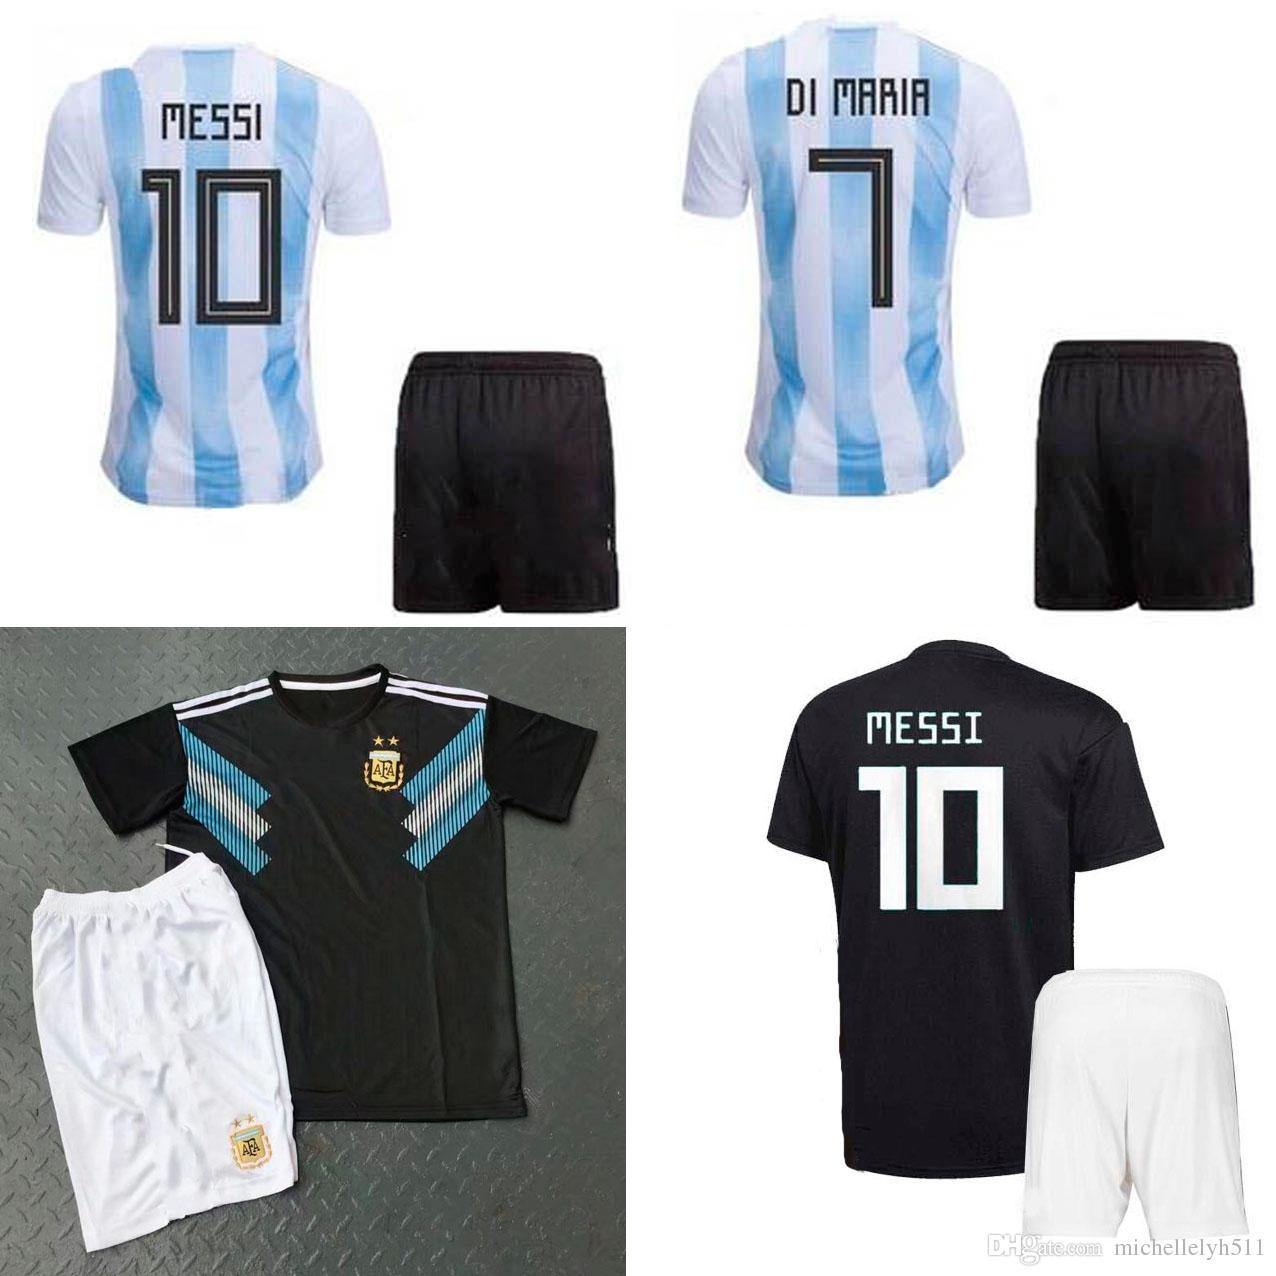 san francisco d2976 698eb 2018 Argentina Soccer Jersey Shorts Messi DYBALA DI MARIA Higuain Aguero  Football Kit 18 19 Argentina Home Away Soccer Sets Sports Uniforms